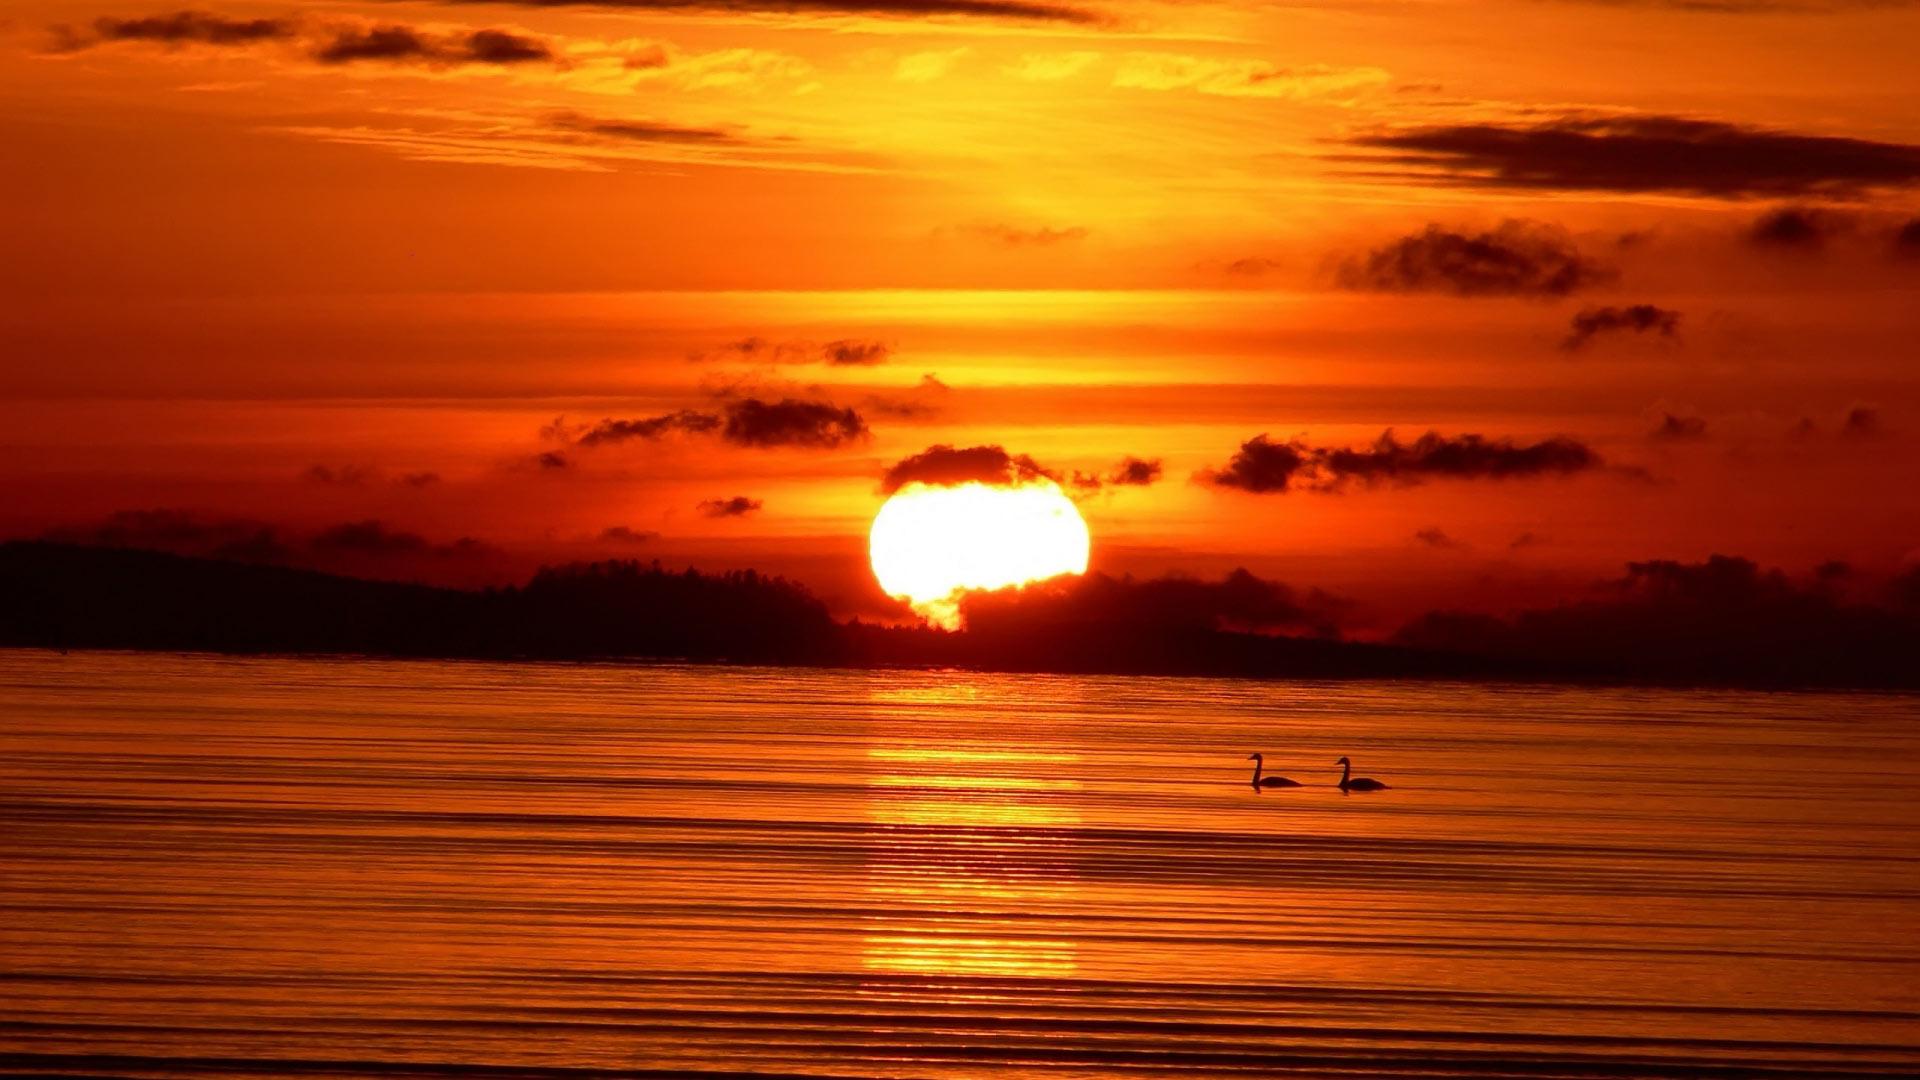 Солнце яркое солнце и красное небо